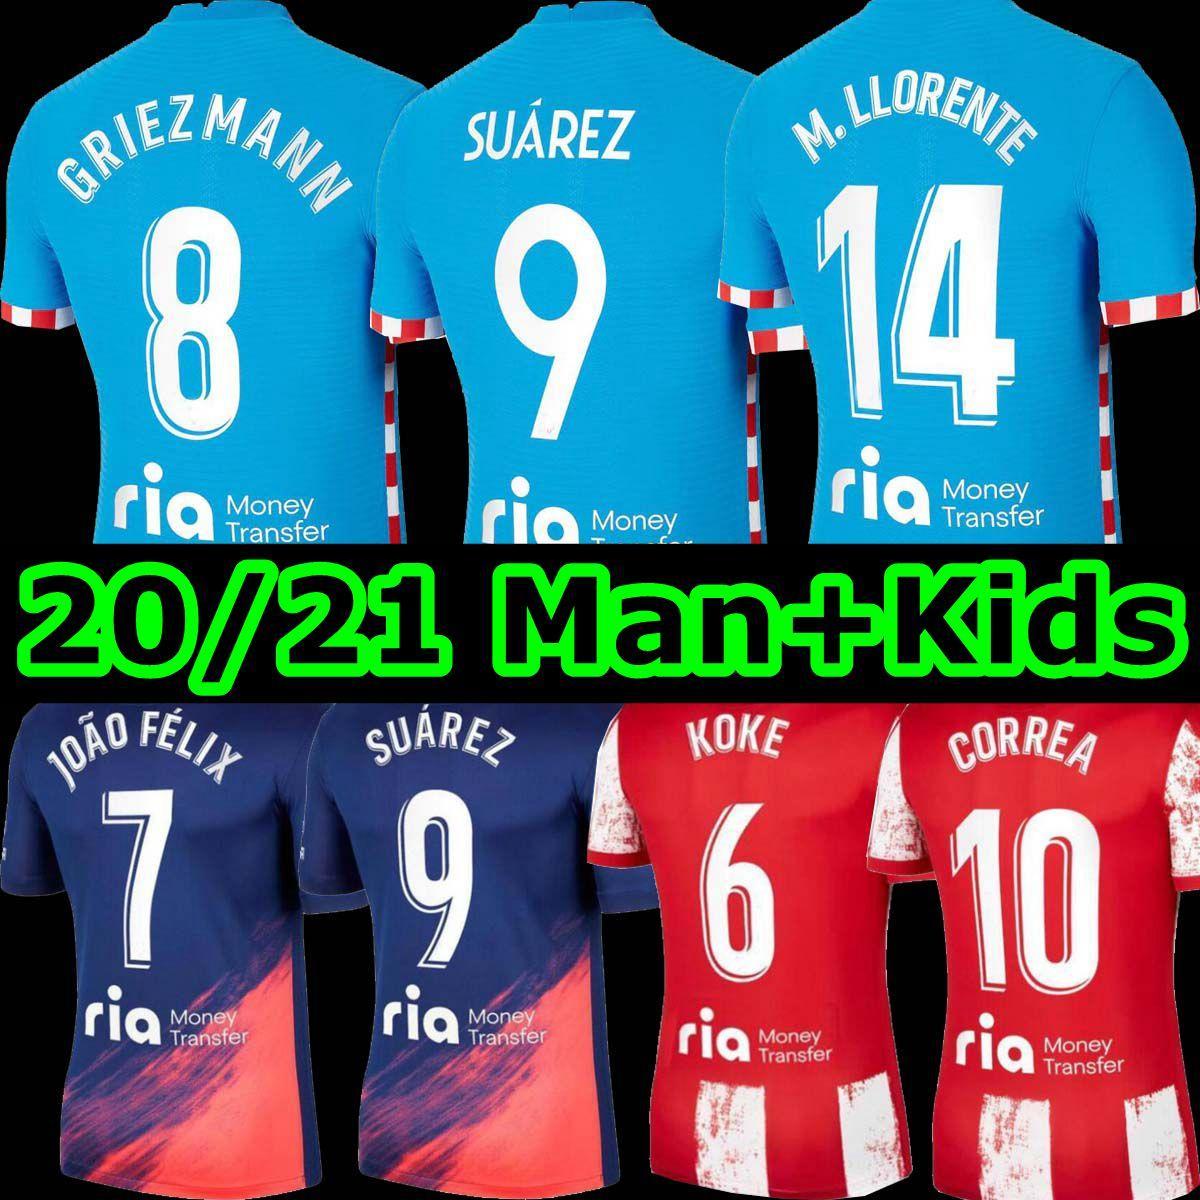 21 22 Atletico مدريد لكرة القدم الفانيلة Suarez João Félix 2021 2022 Grizmann Correa Koke Camisetas دي Fútbol Lemar Carrasco de Paul Men Kids Kit Coot Shirts Tops